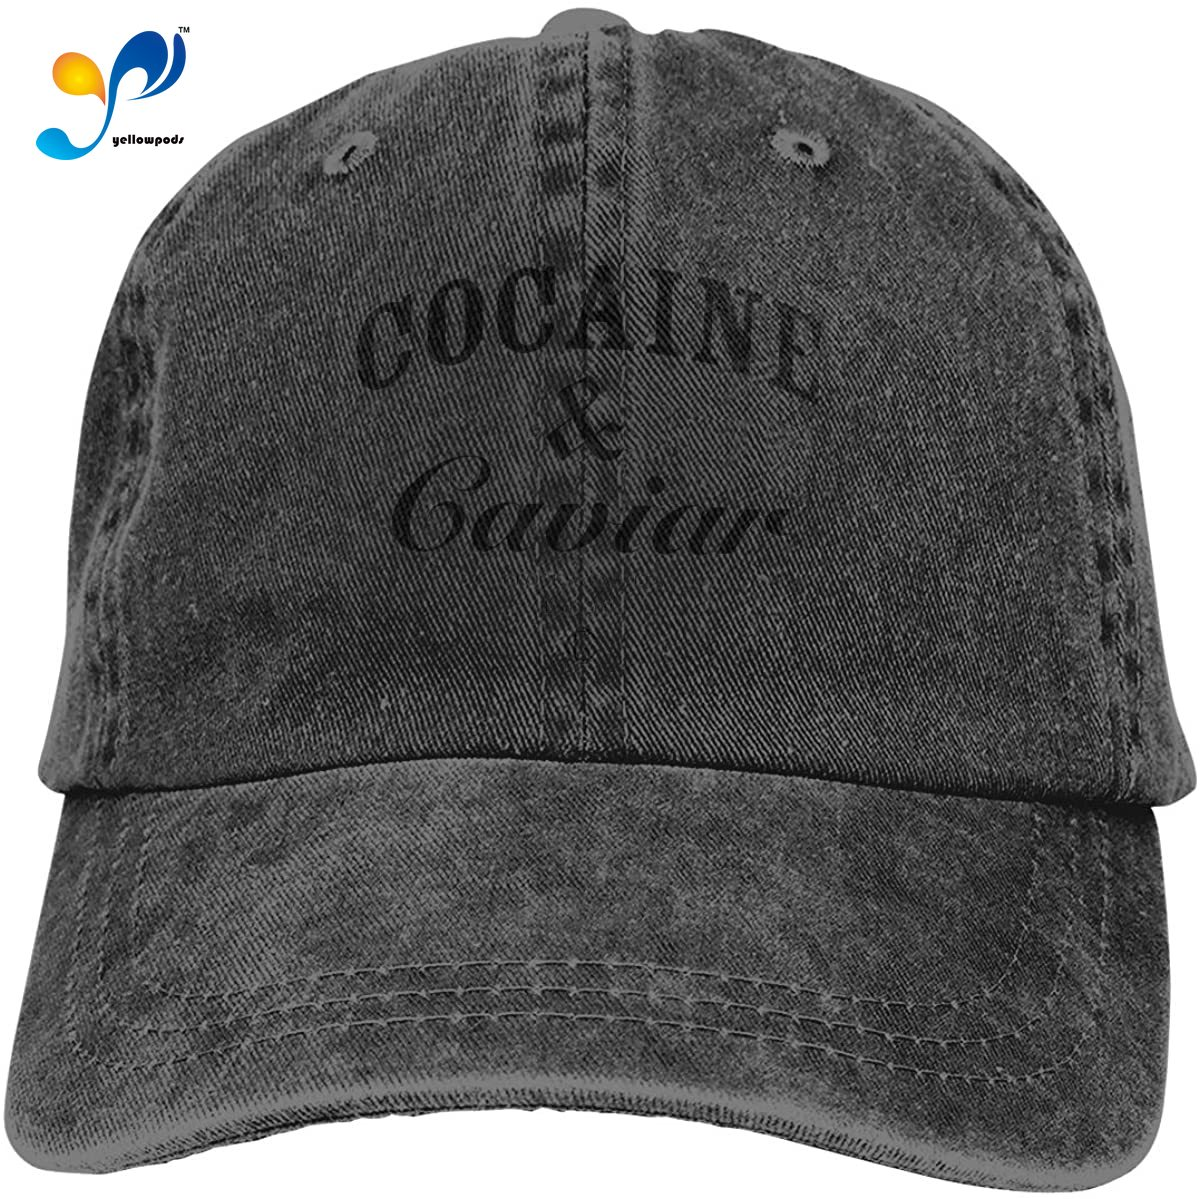 AiFuShi Cocaine Caviar Sports Denim Cap Adjustable Snapback Casquettes Unisex Plain Baseball Cowboy Hat Black